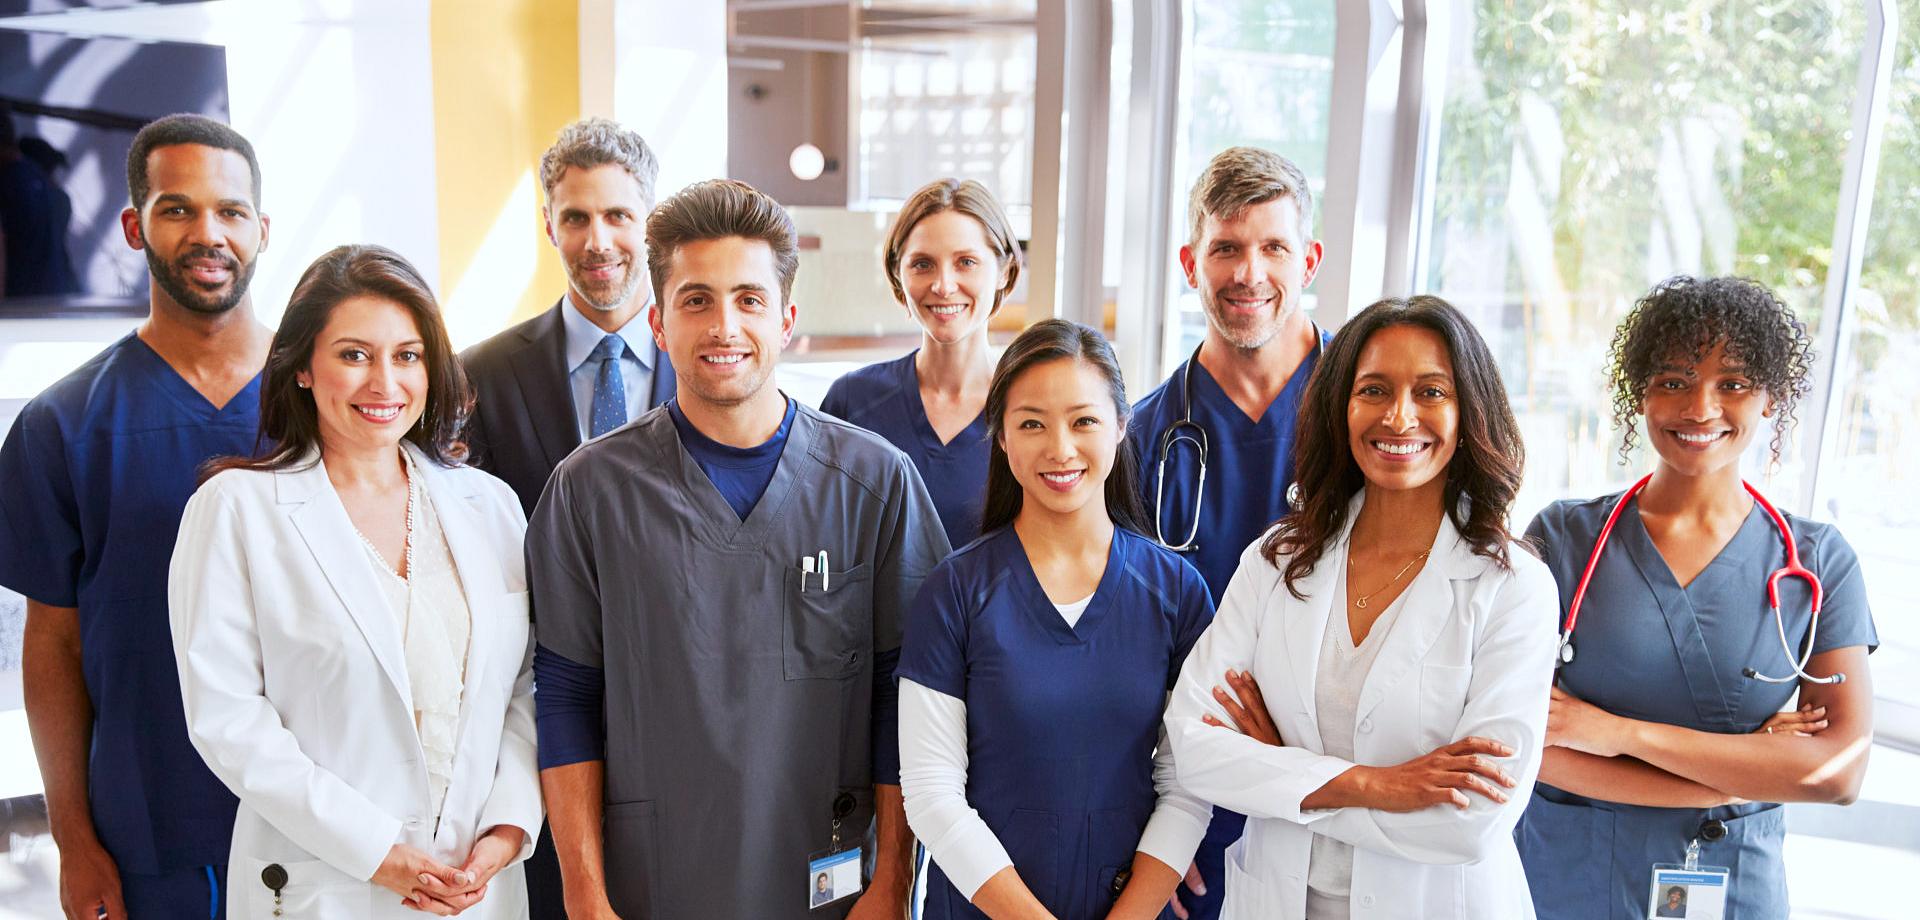 healthcare staffs smiling